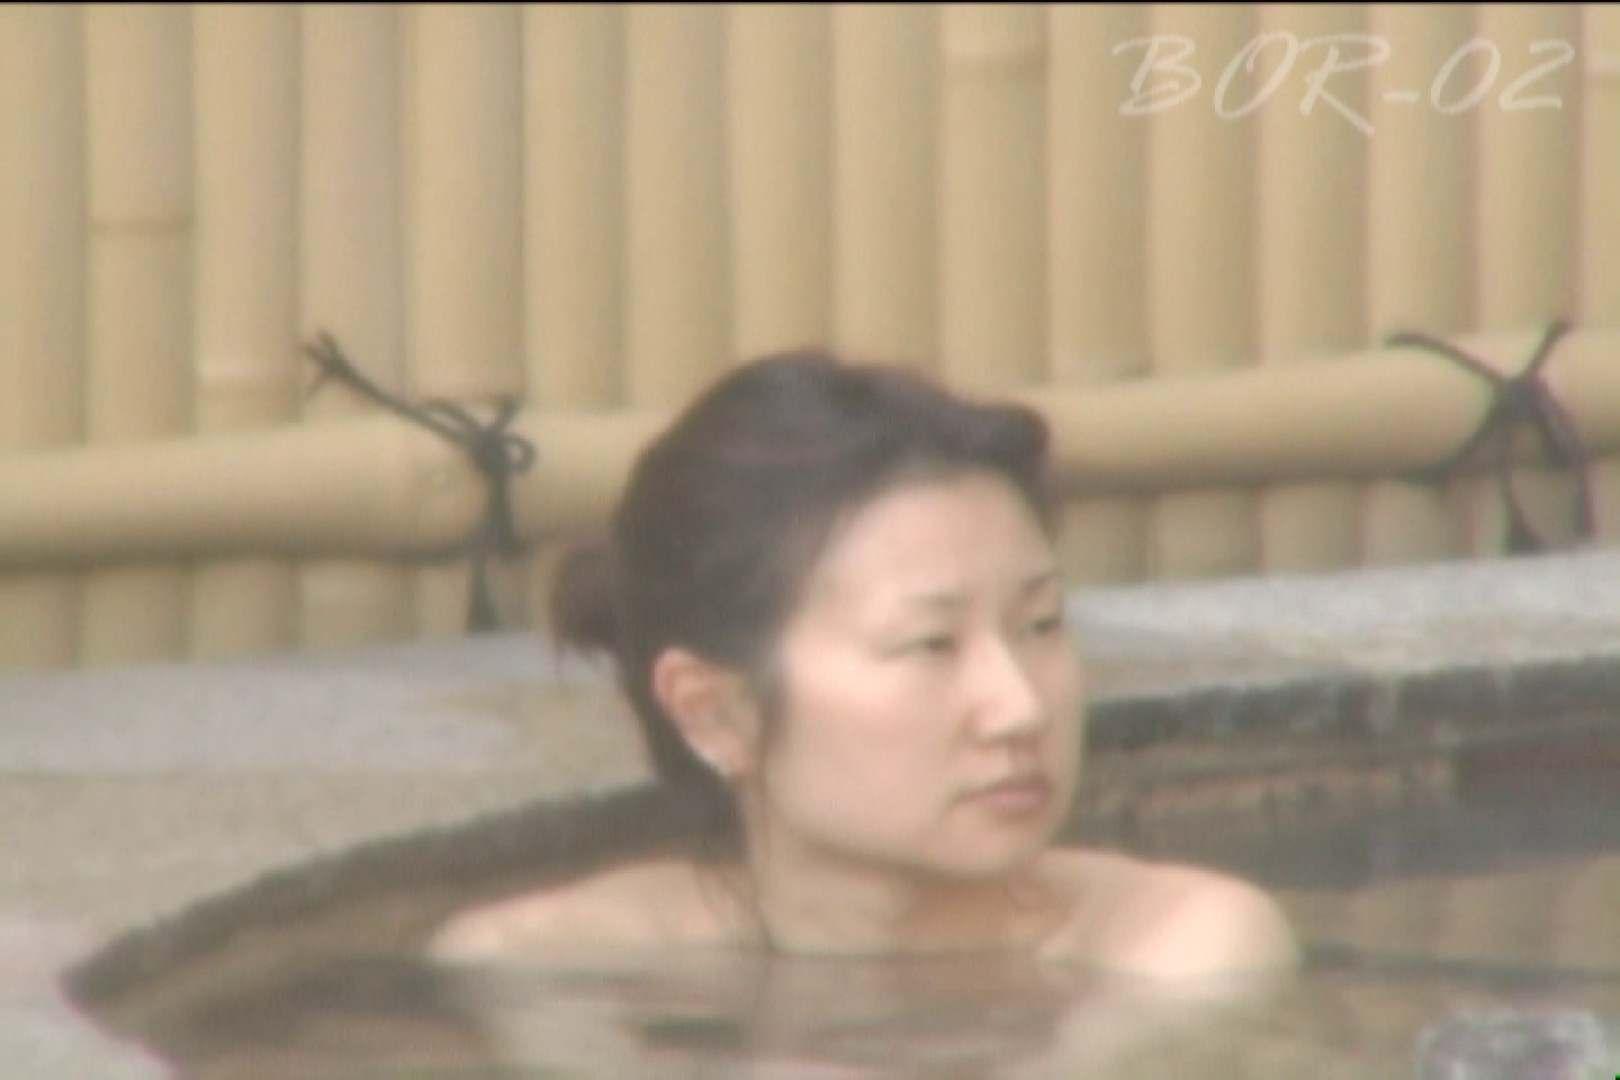 Aquaな露天風呂Vol.477 0 | 0  28連発 3